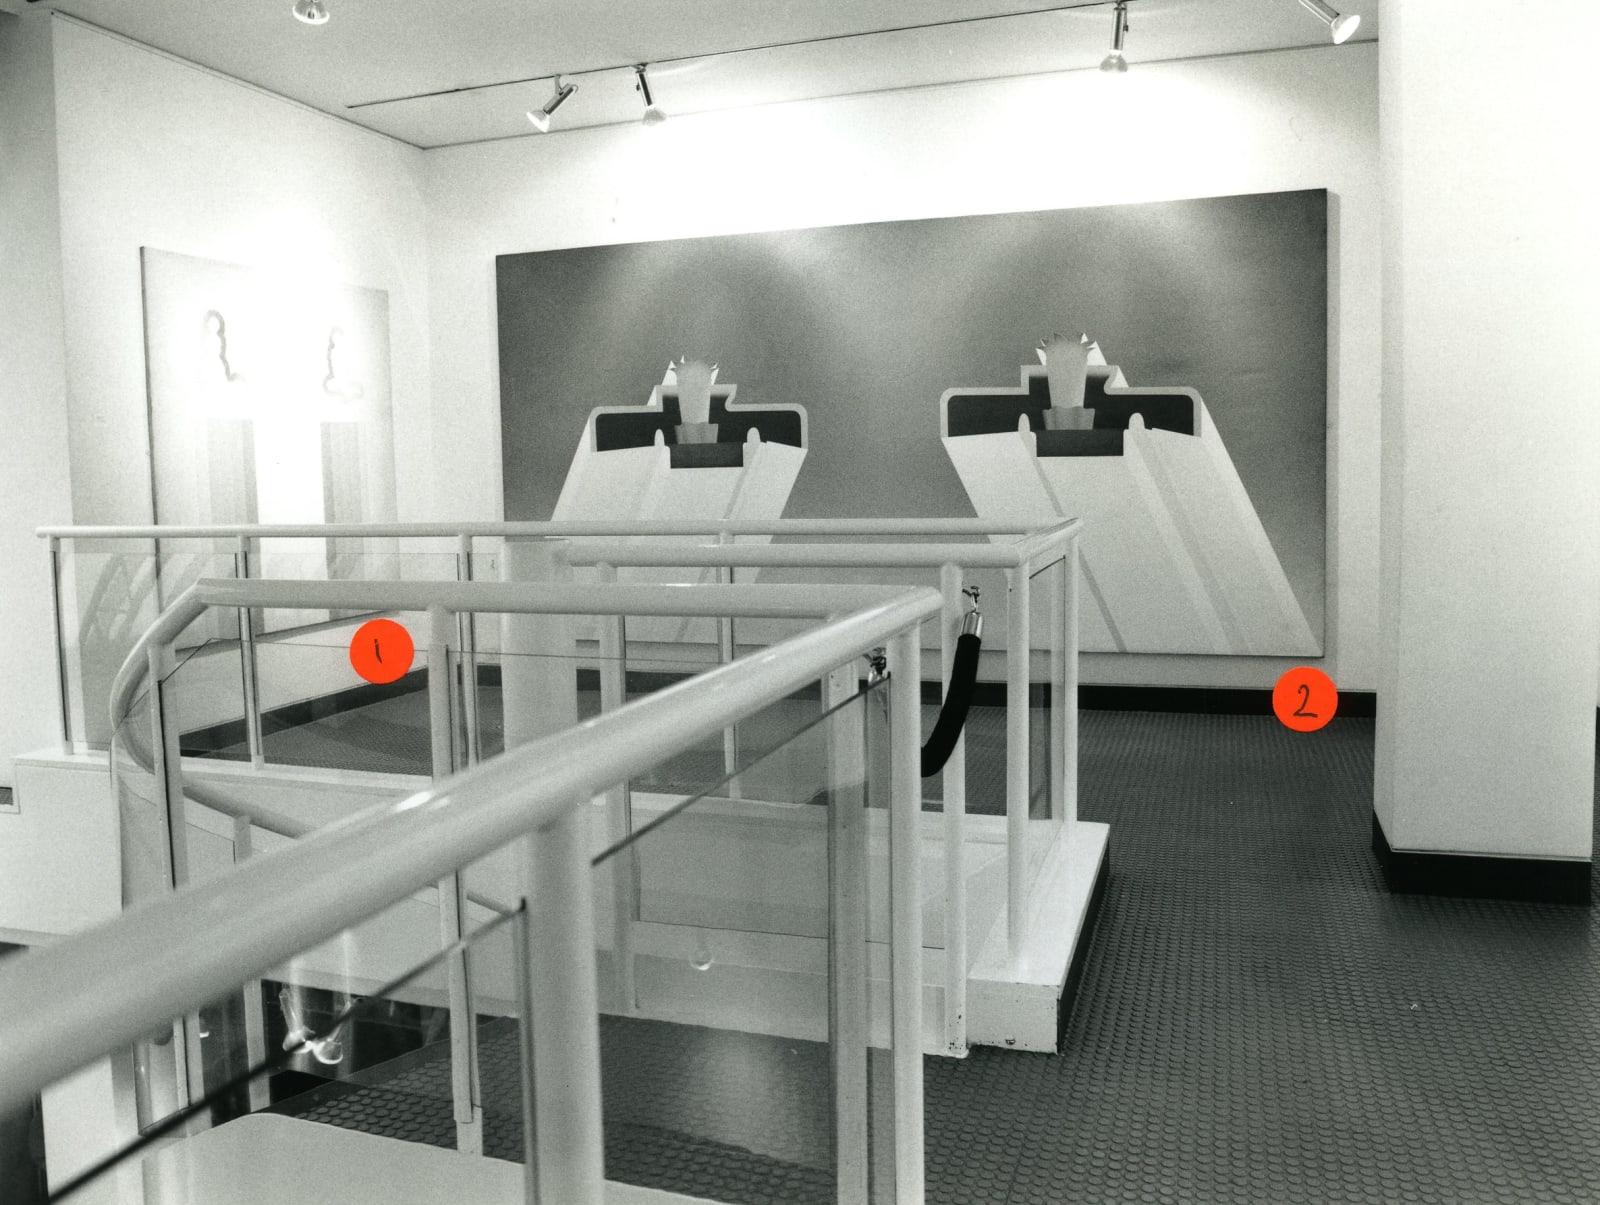 ANTONY DONALDSON Installation View